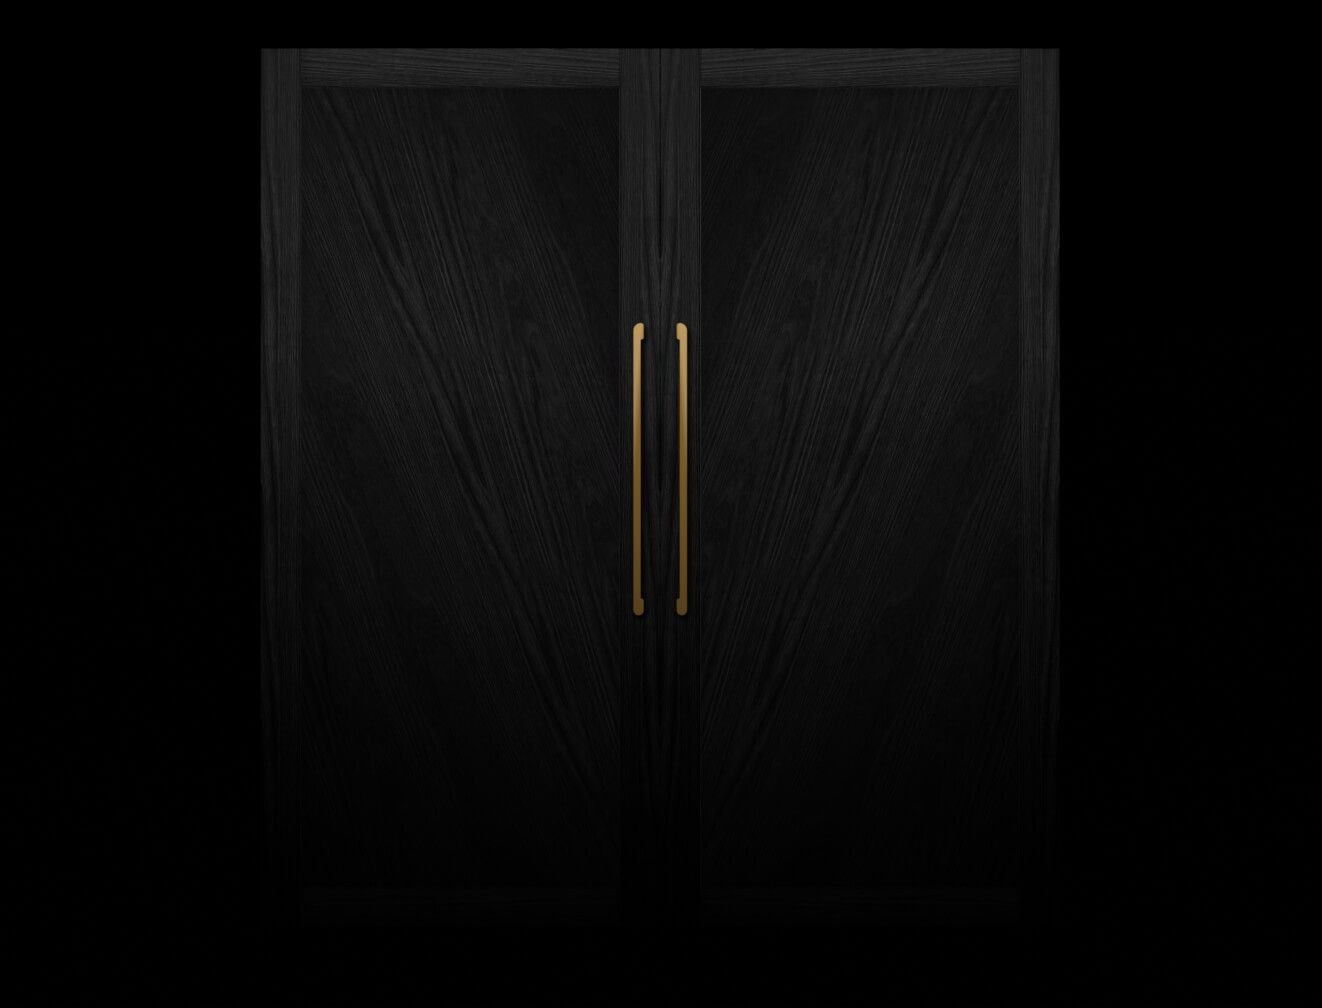 Panel Ready refrigerator doors